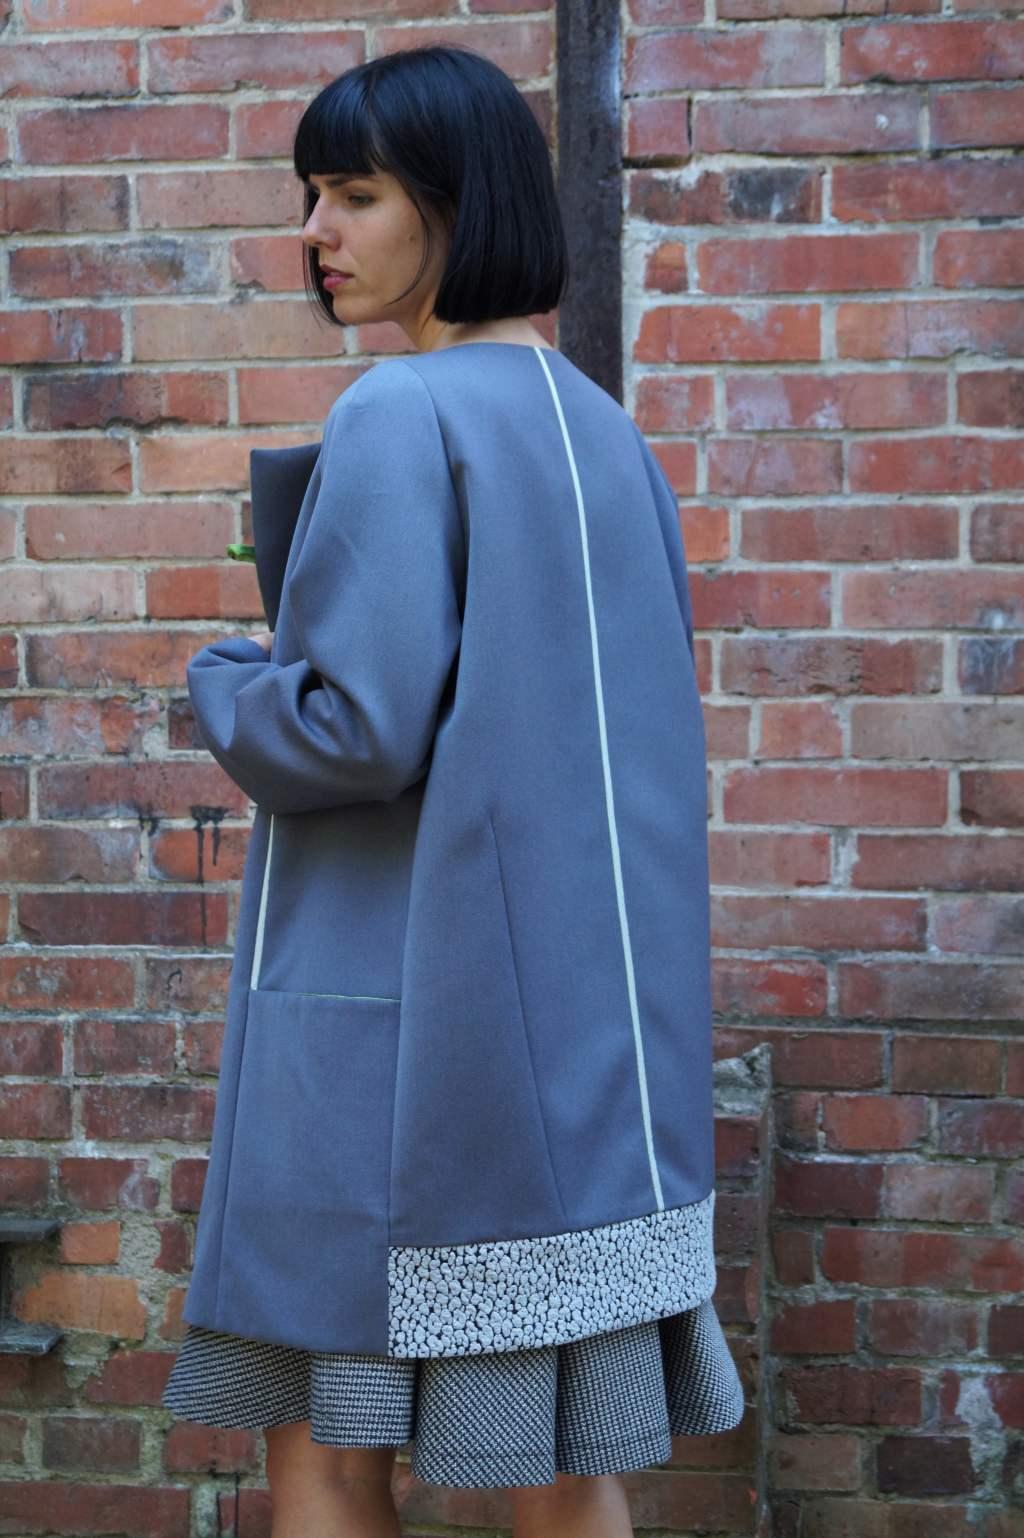 Blaue Jacke von Gisela Berg